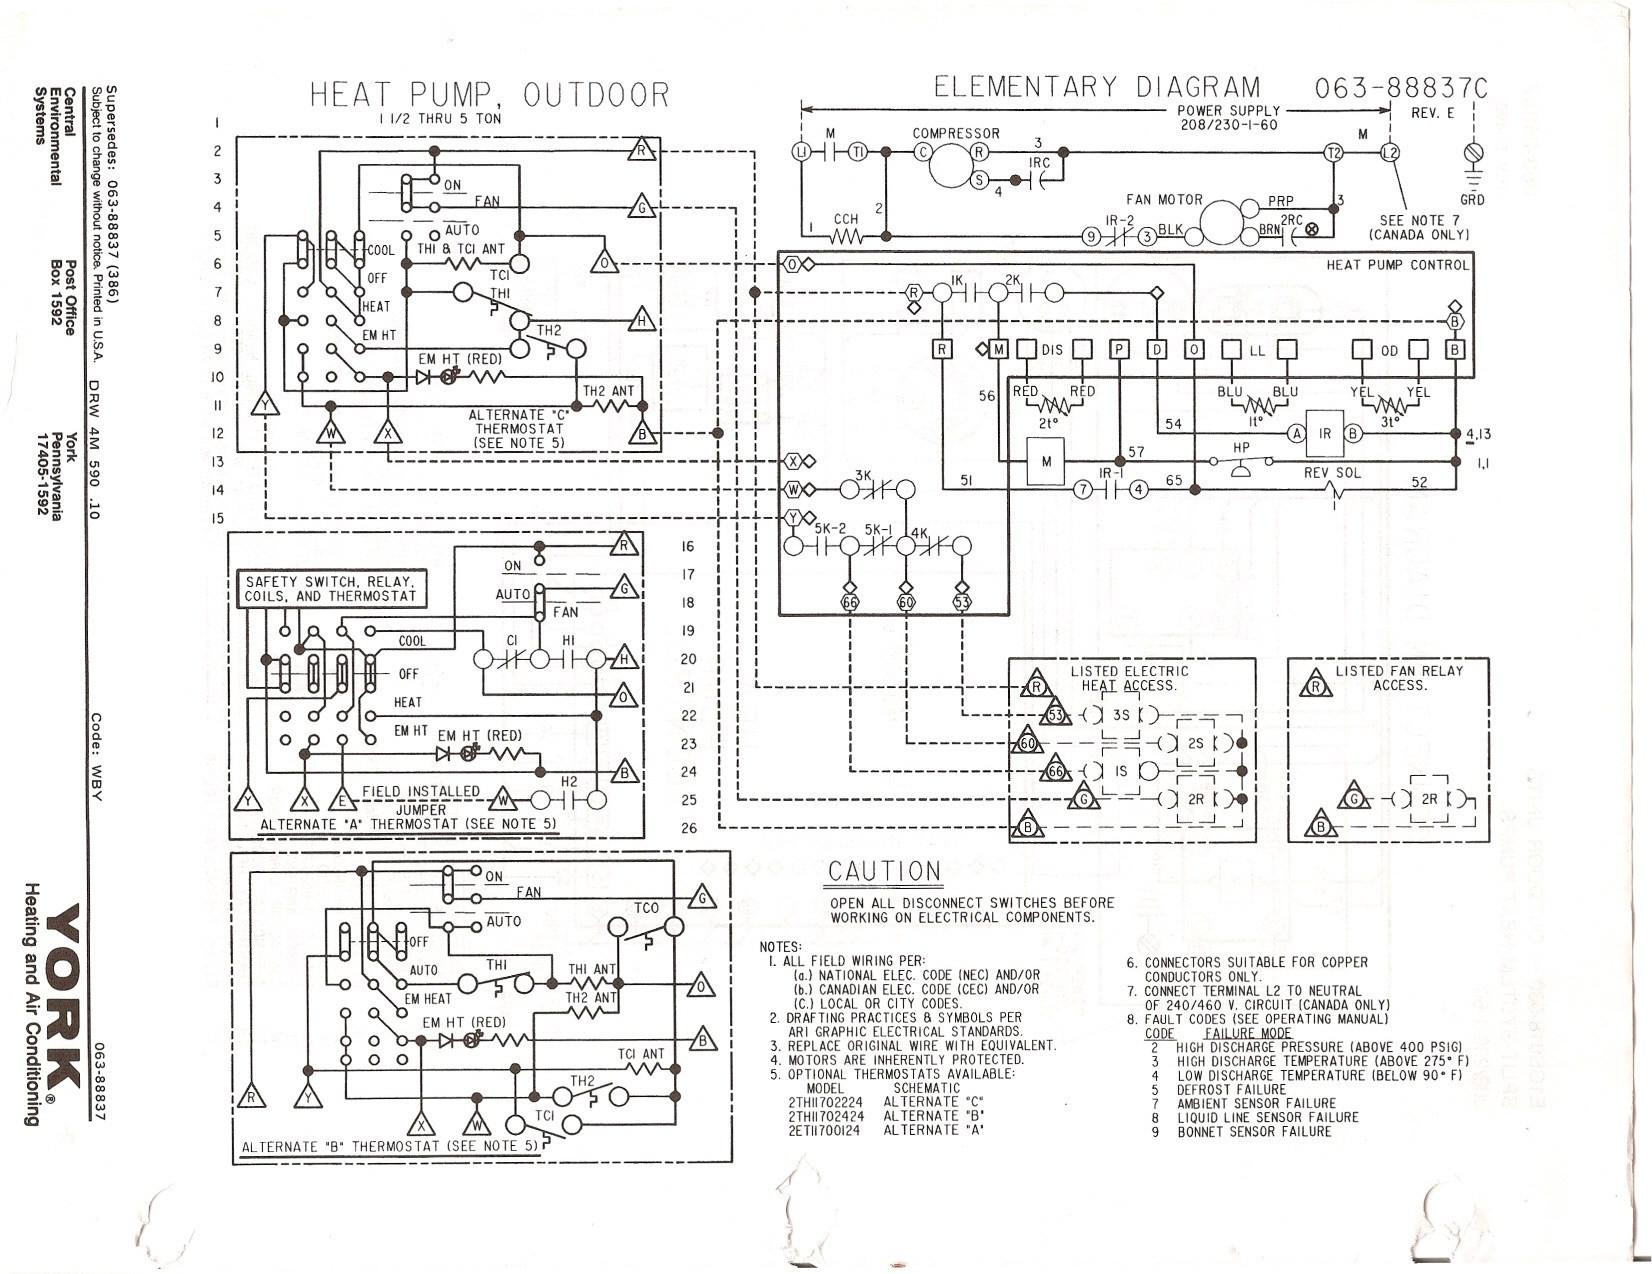 compressor 3 5 ton wiring harness schematic diagram downloadcarrier 5 ton wiring diagram wiring diagramcarrier 5 ton wiring diagram